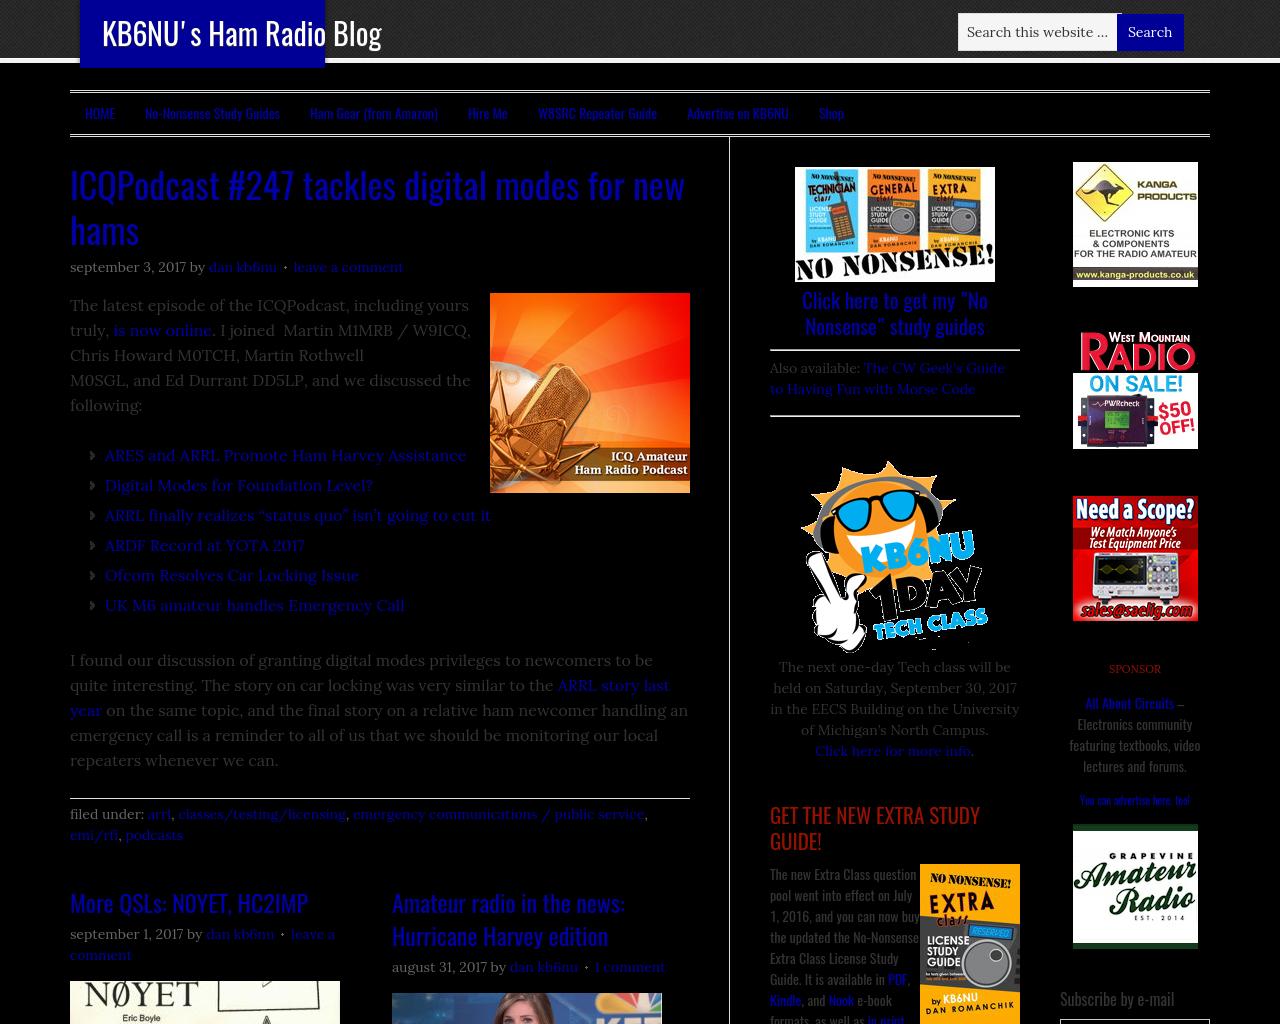 KB6NU-Advertising-Reviews-Pricing